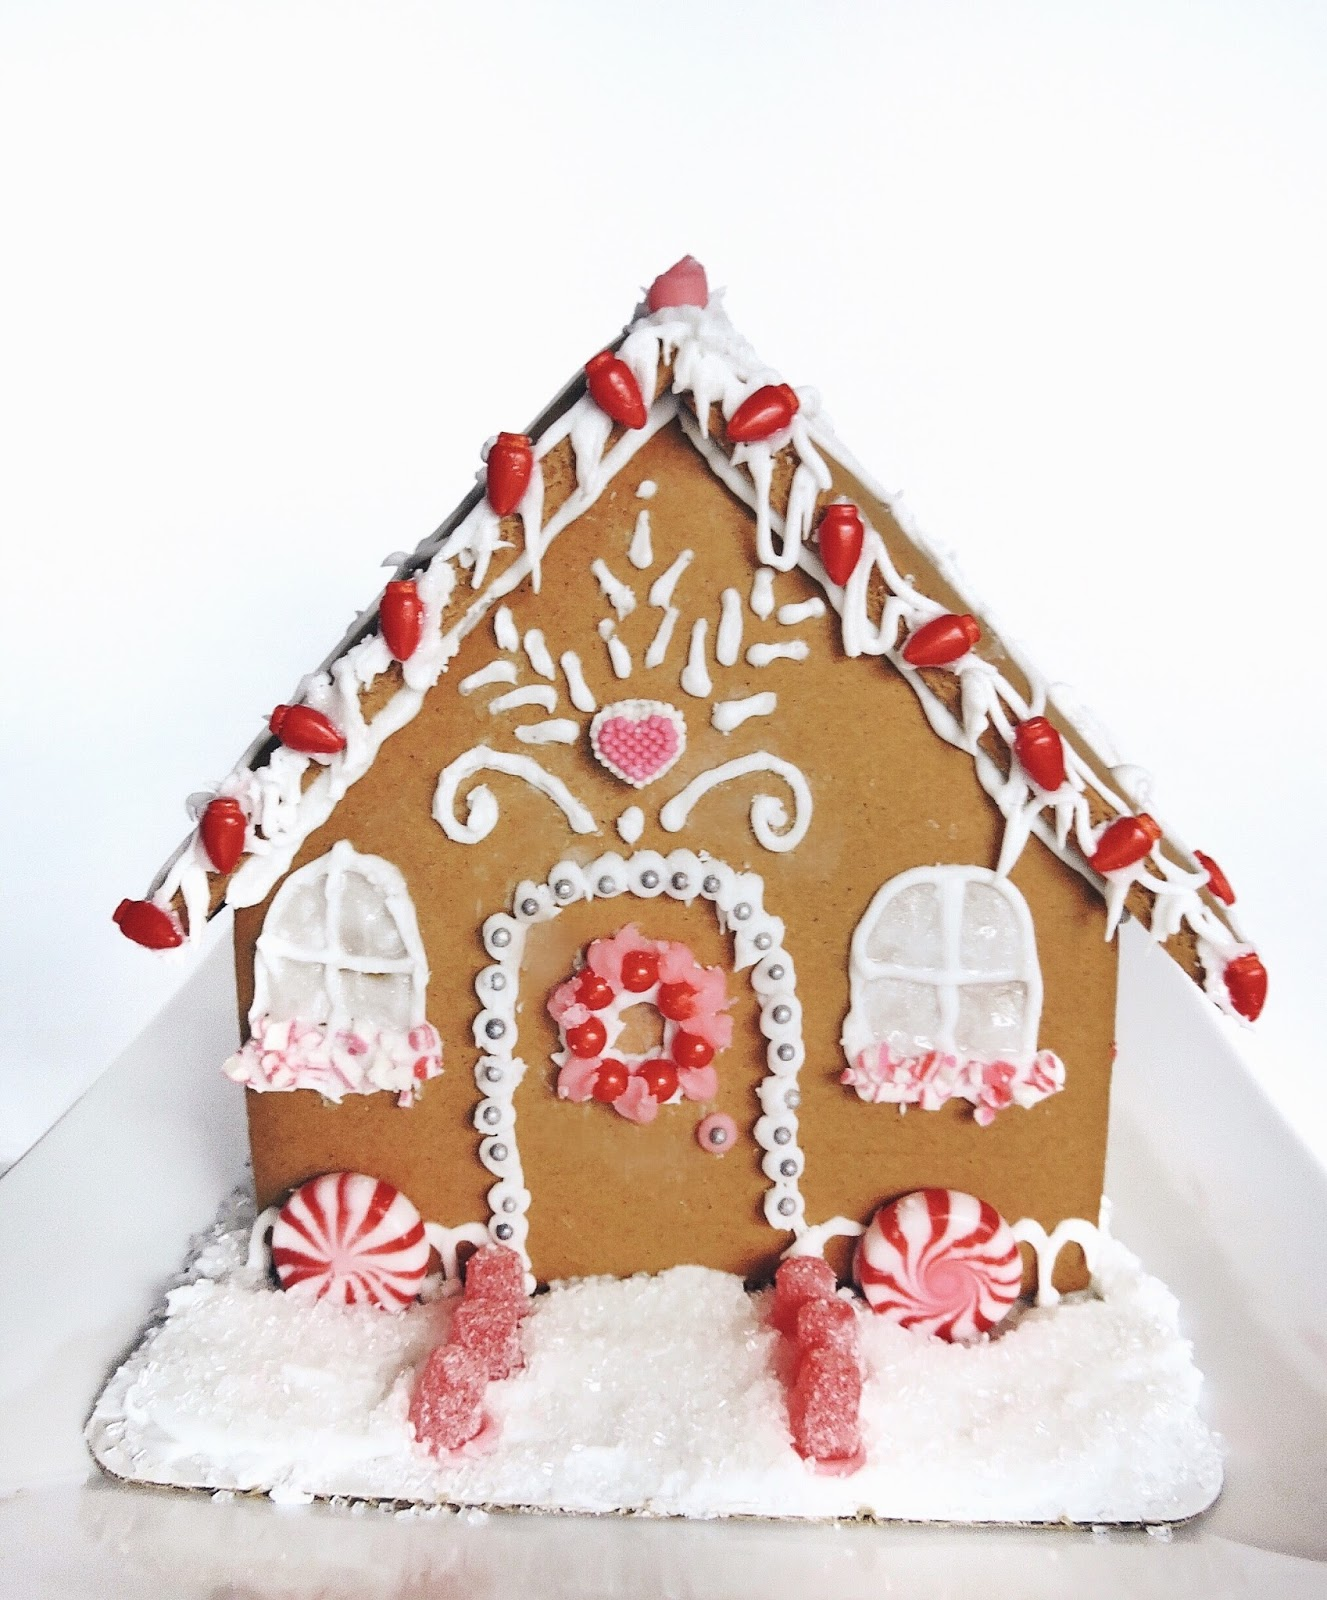 baking sugarly michaels wilton gingerbread house kit Christmas decor sweets Scandinavian Swedish Norwegian